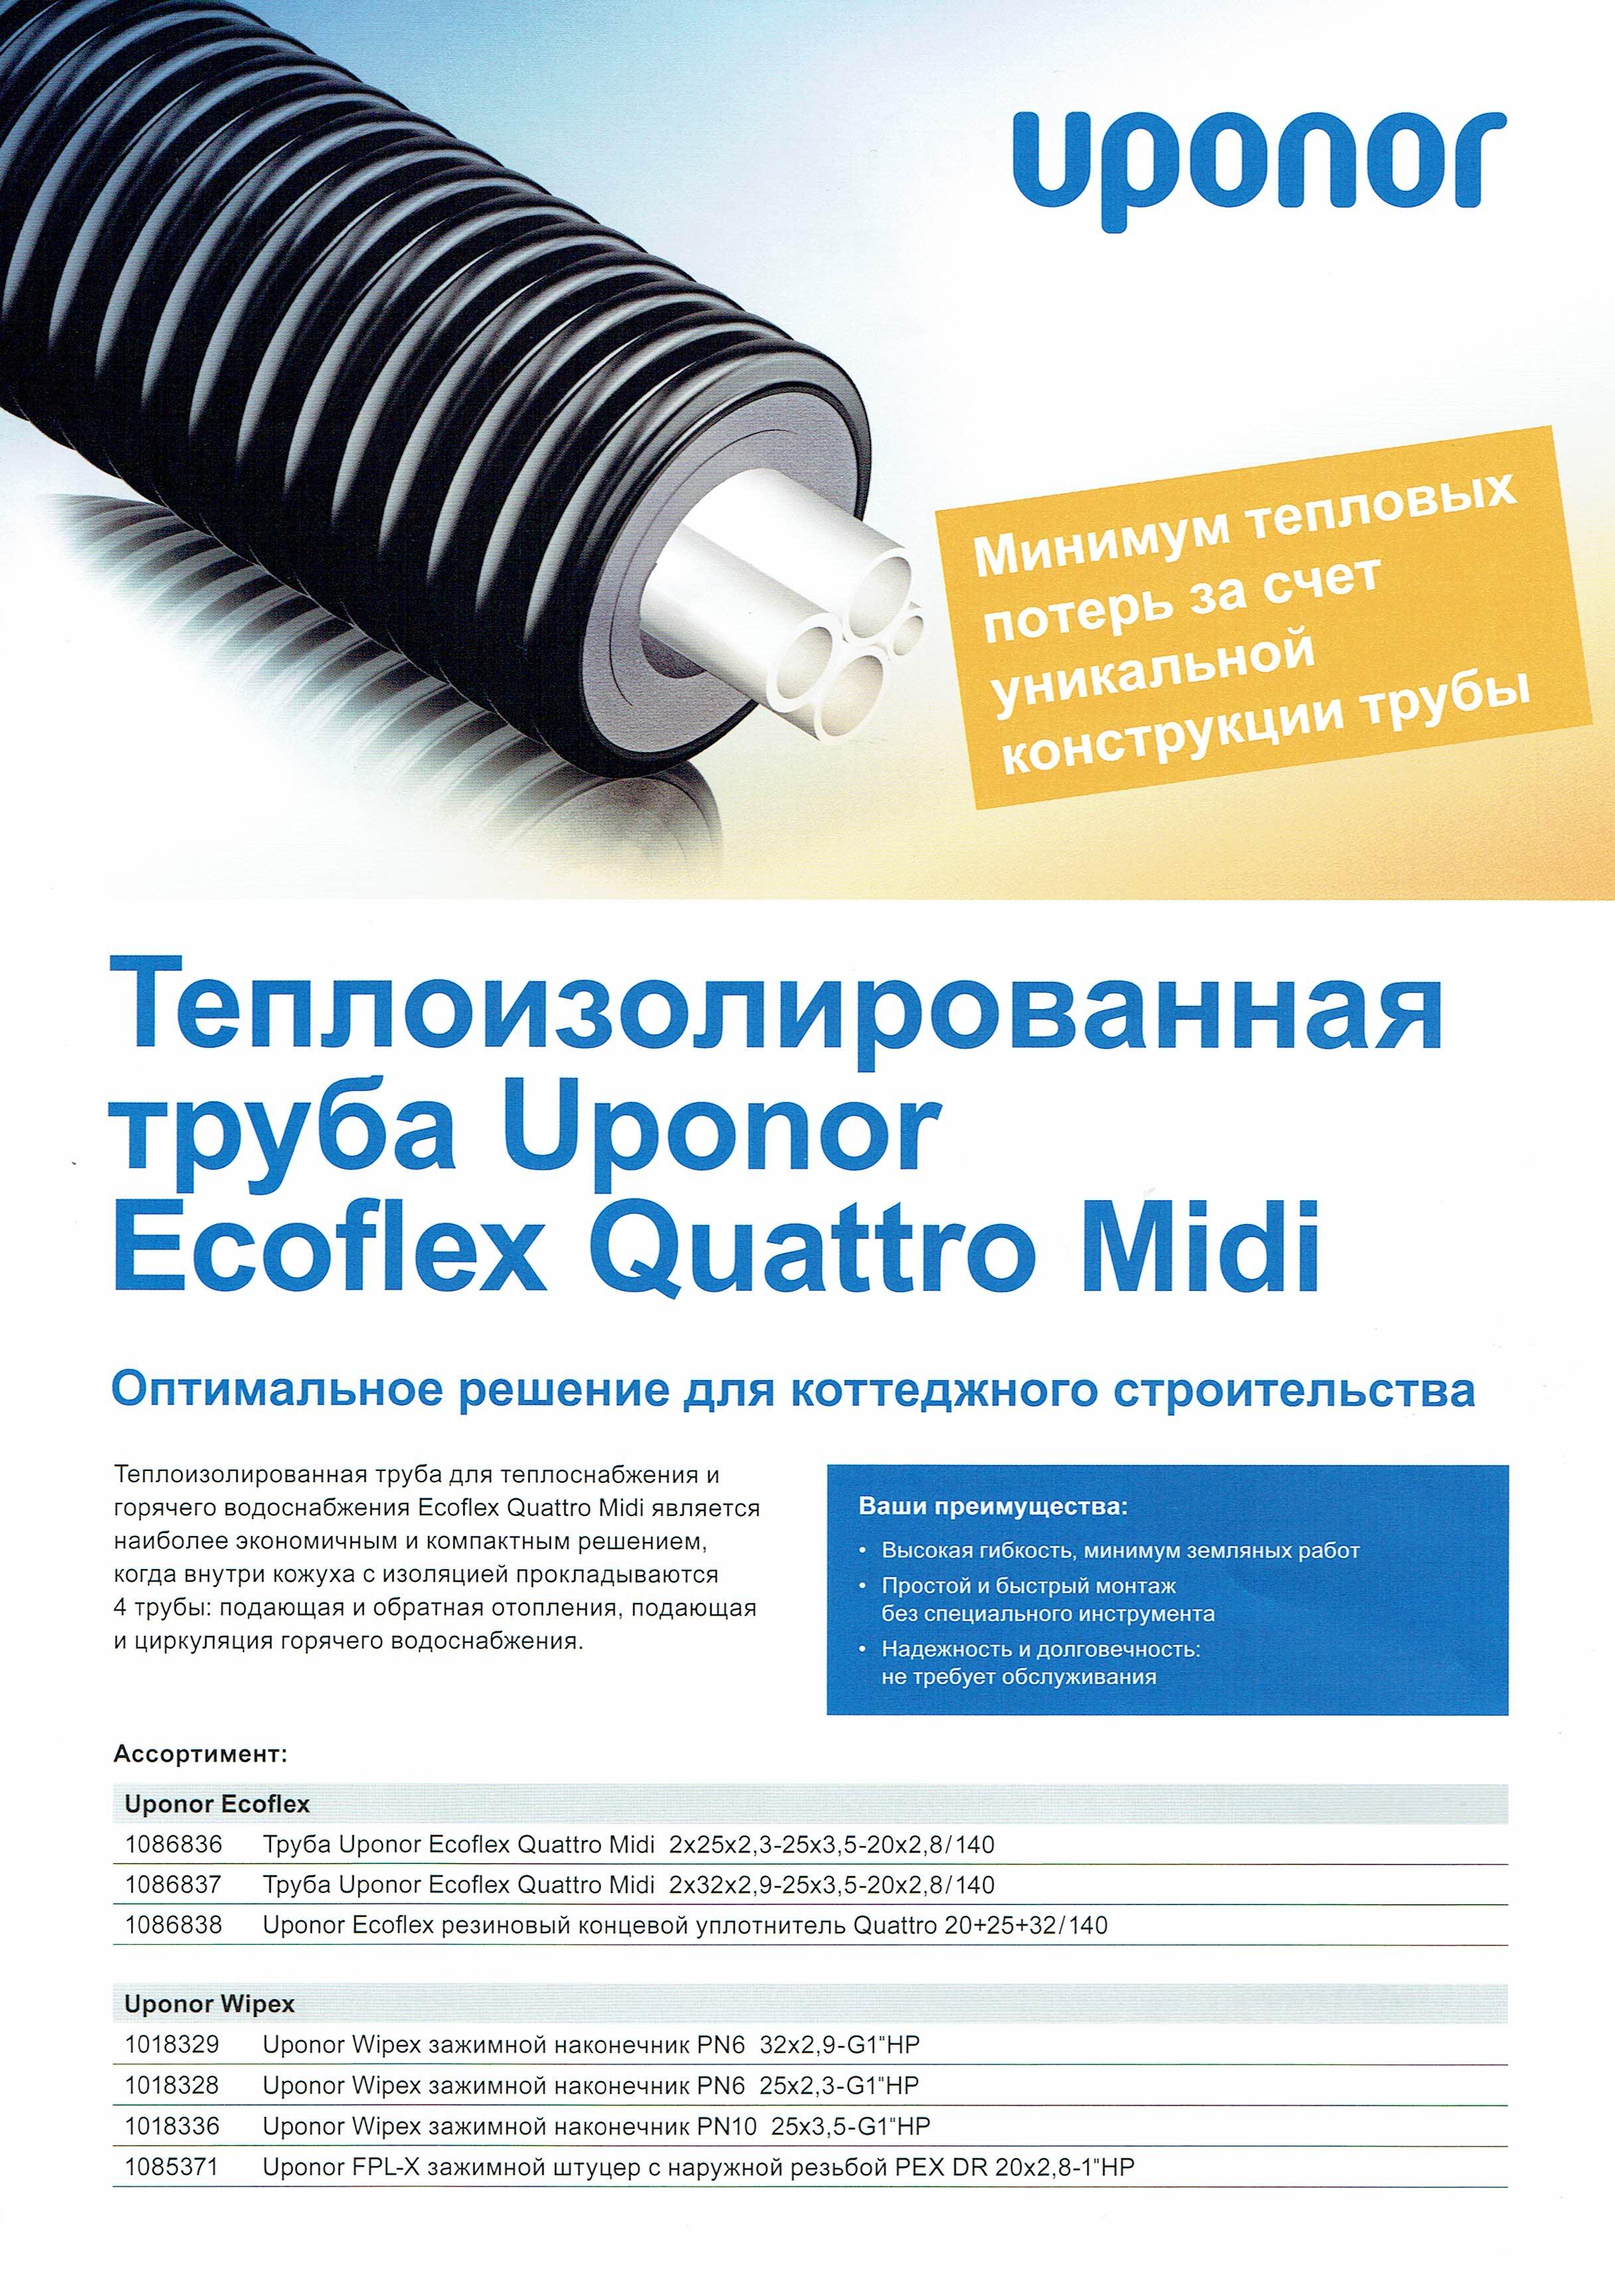 Теплоизолированная труба Uponor Ecoflex Quattro Midi